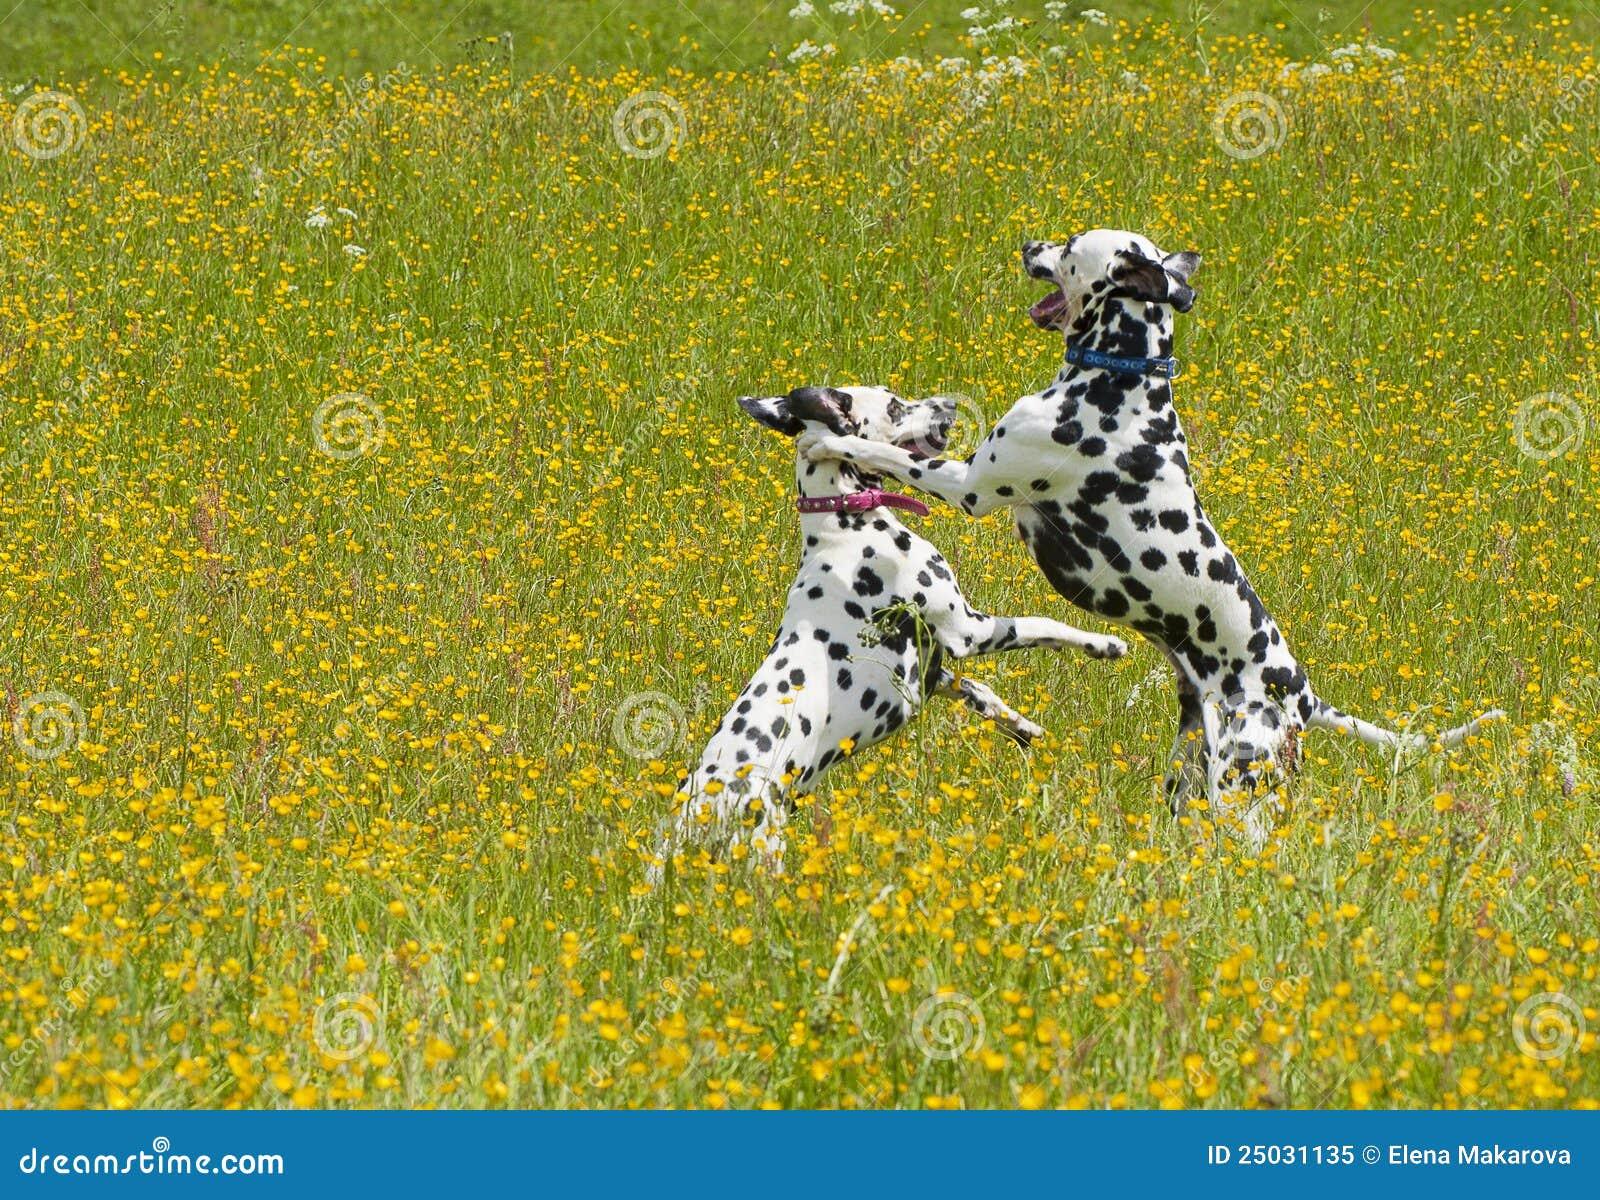 Playing Dalmatians